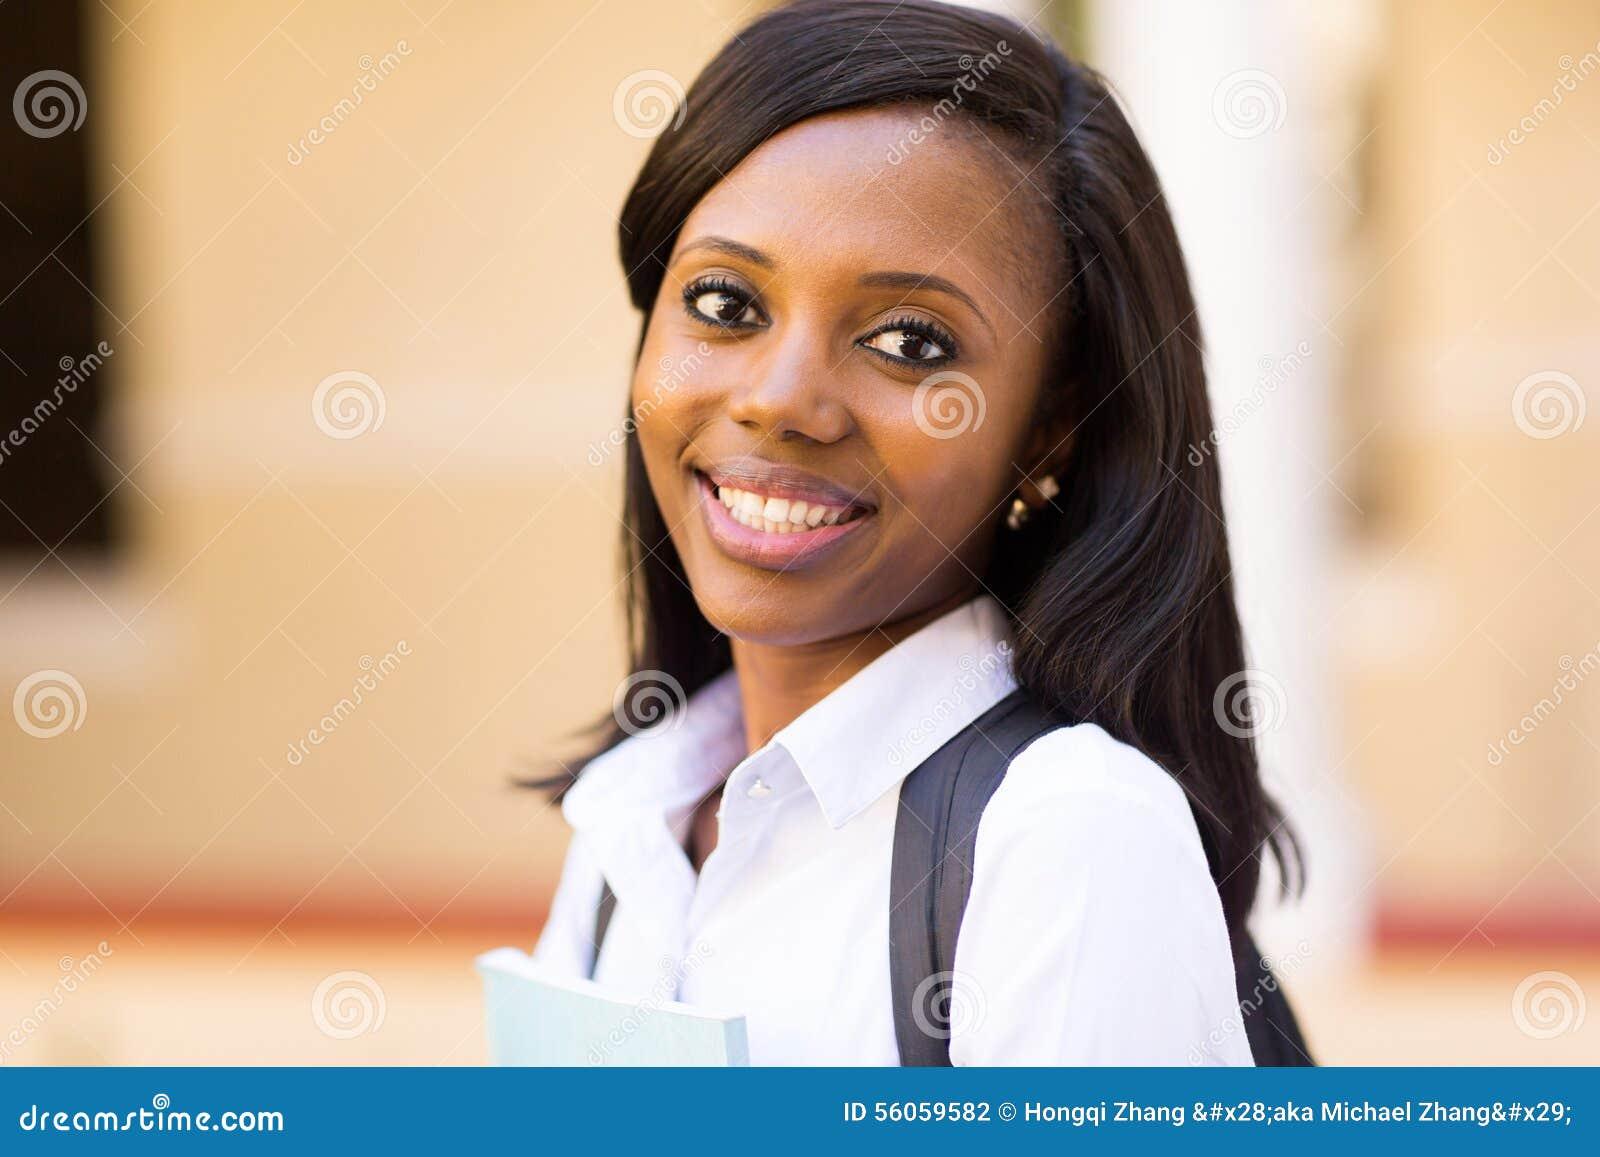 Afro american university student